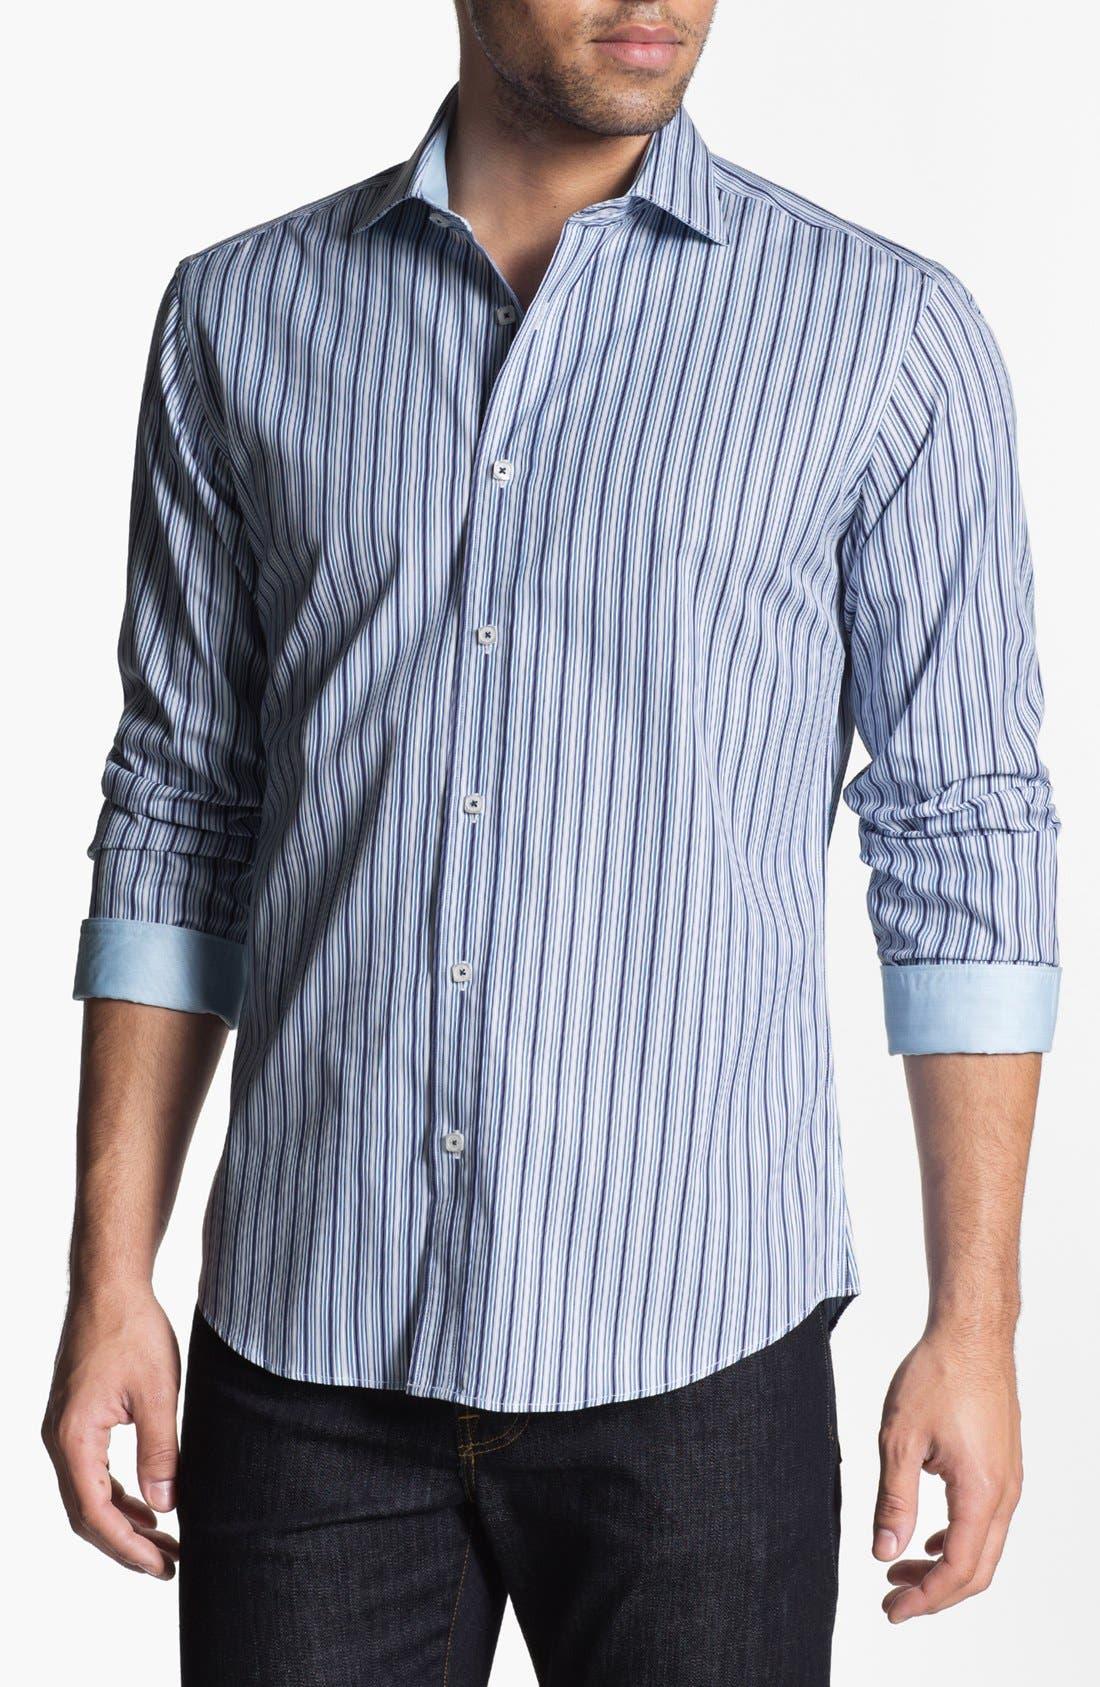 Main Image - Bugatchi Striped Shaped Fit Cotton Sport Shirt